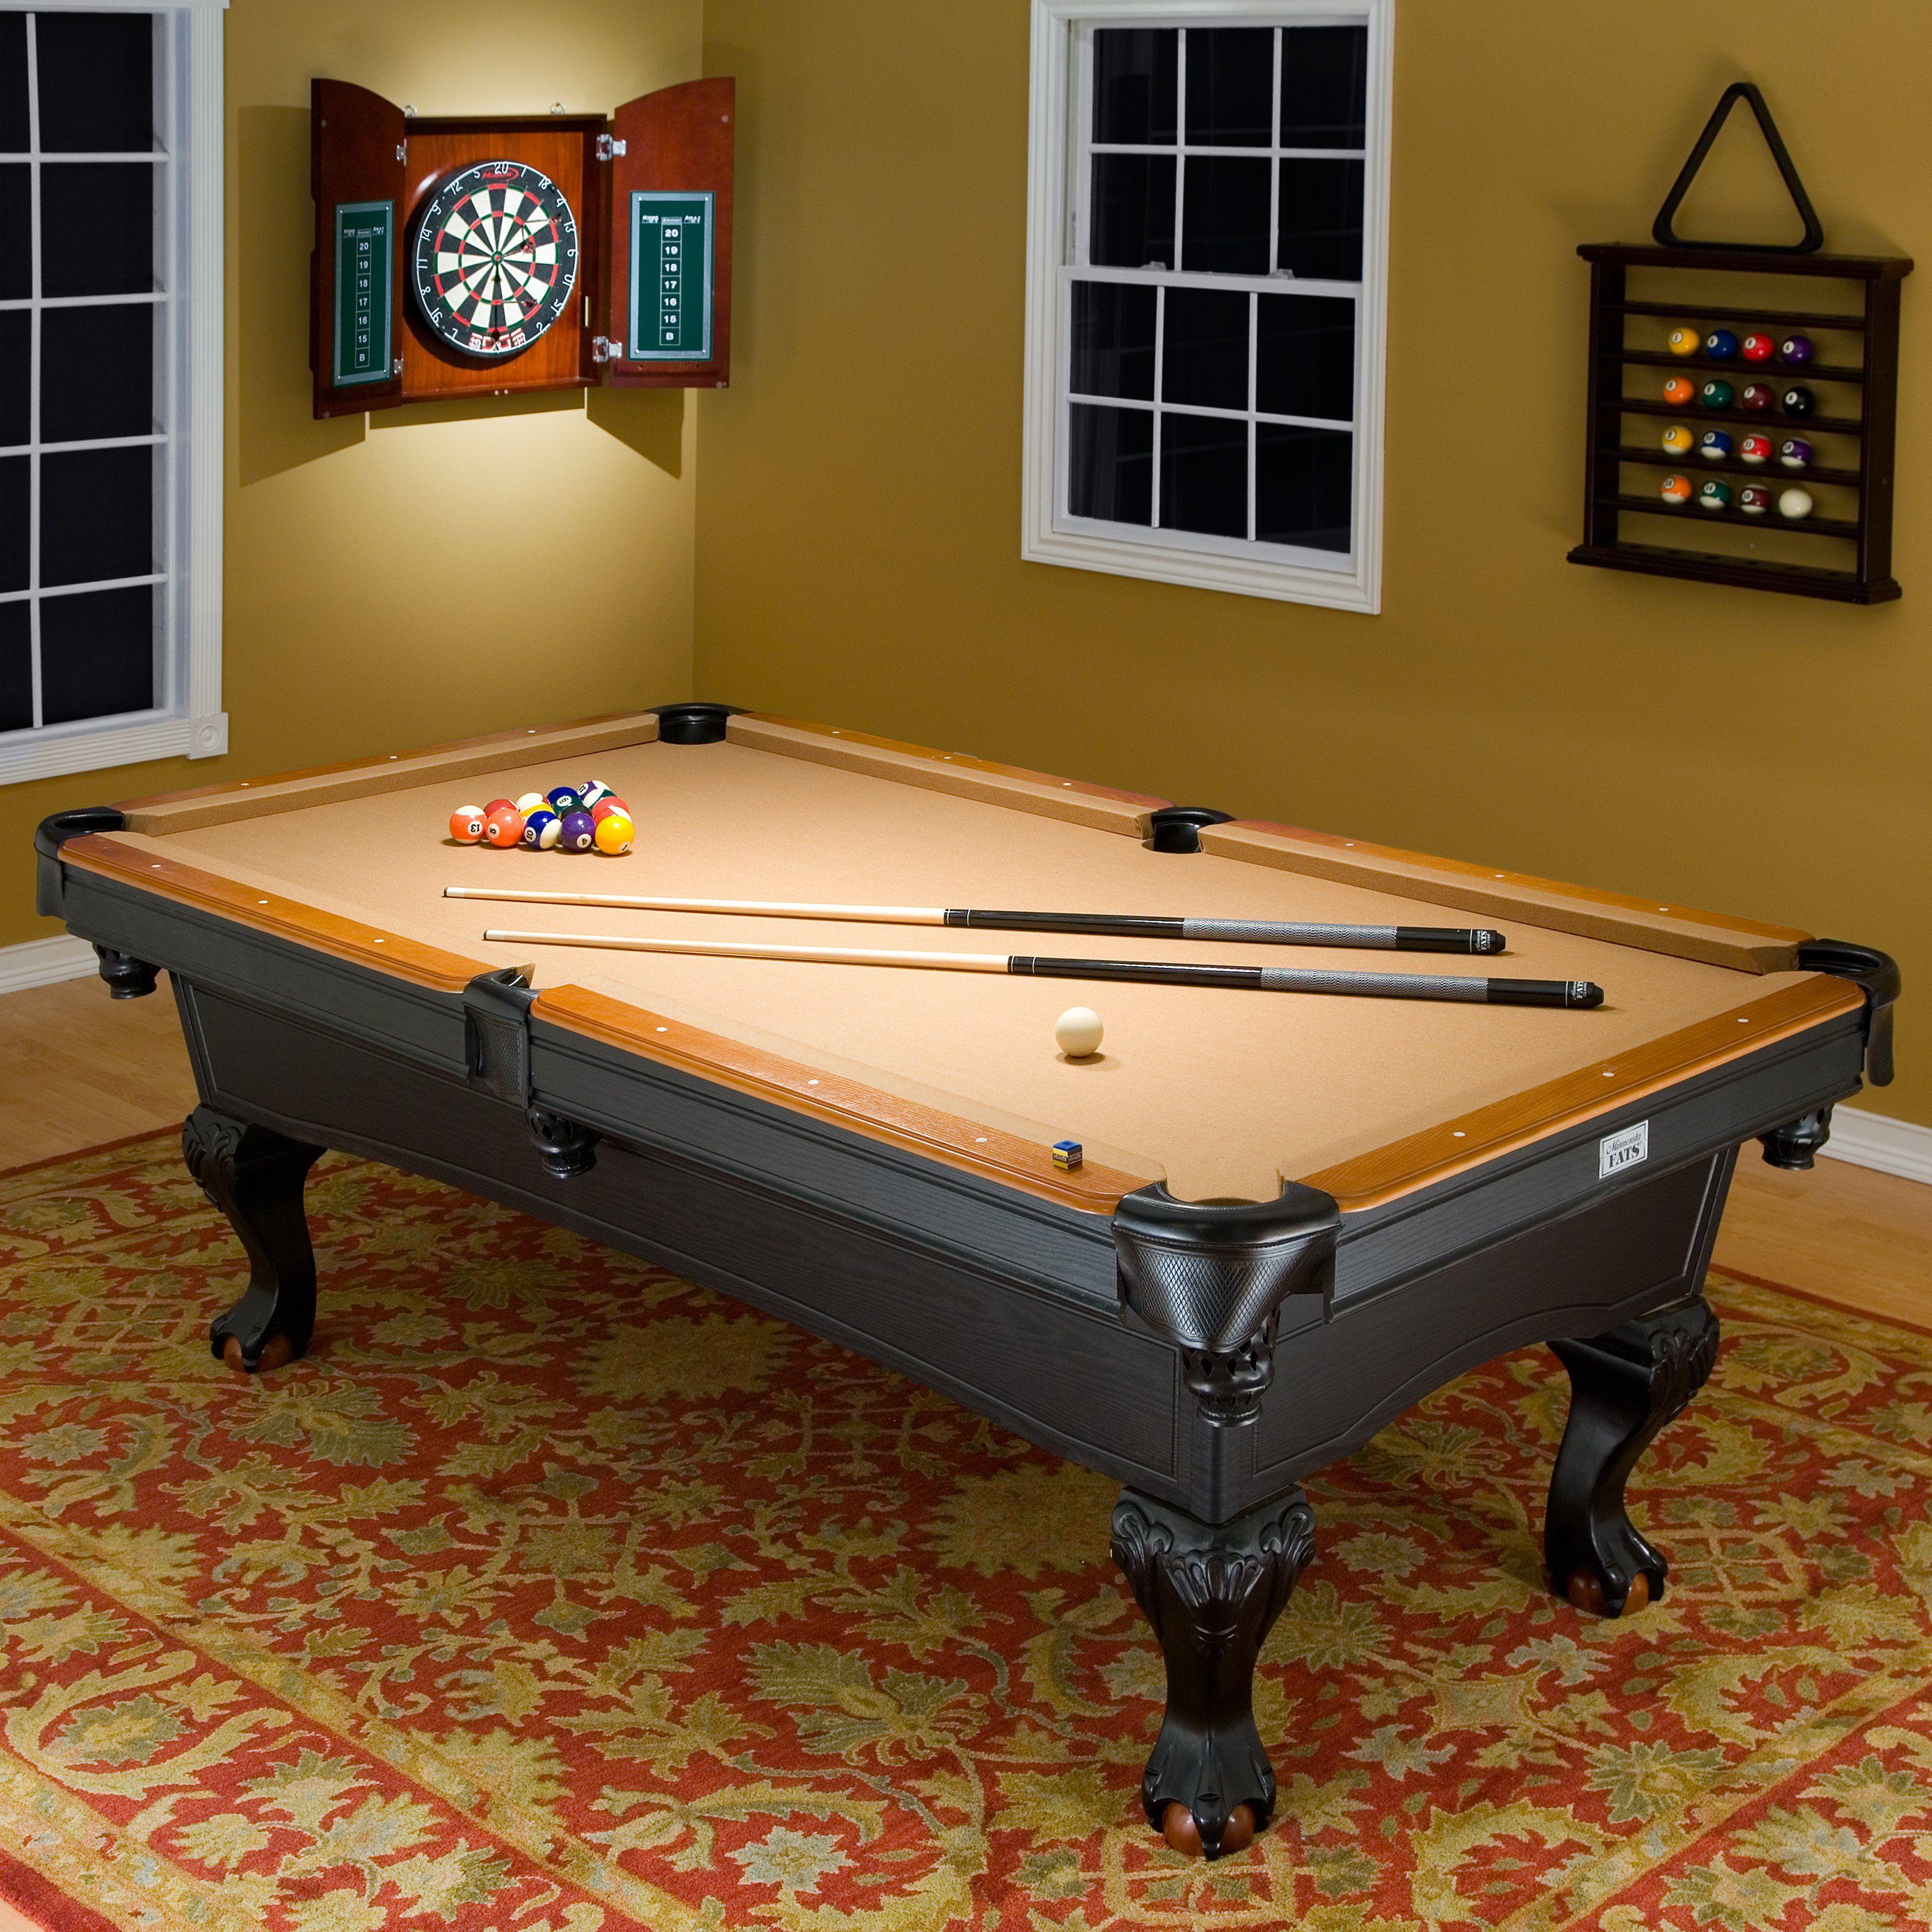 Covington Billiard Table   The Minnesota Fats Covington Billiard Table   8  Ft. Is An Affordable Full Sized Pool Table Thatu0027s Perfect For The Game Room.